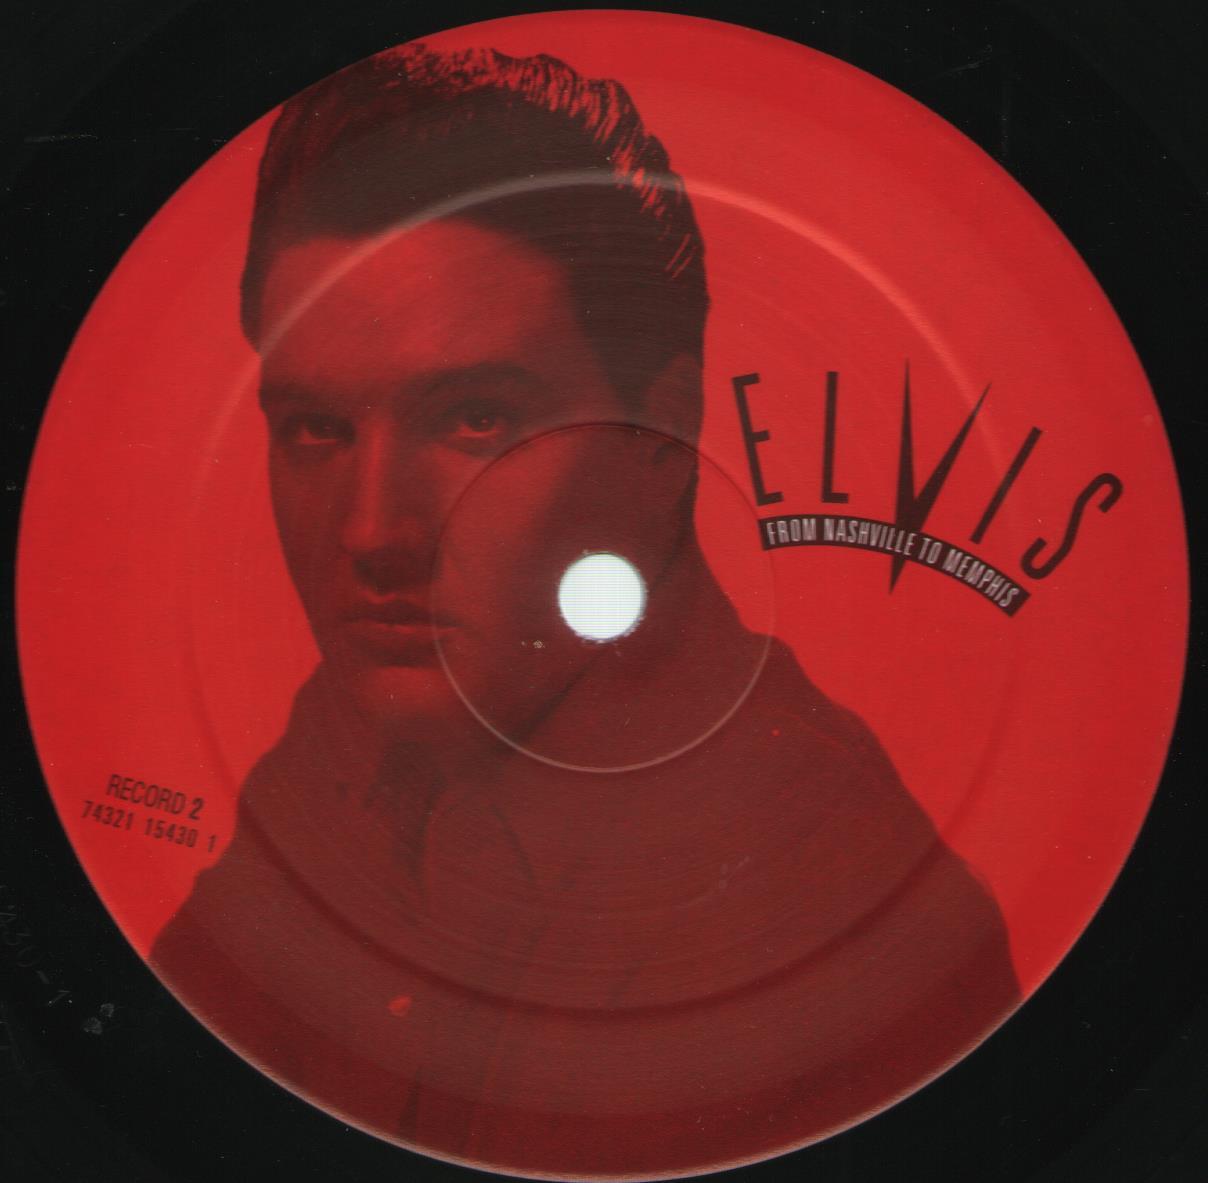 ELVIS - FROM NASHVILLE TO MEMPHIS - THE ESSENTIAL 60'S MASTERS Bild42aj9s